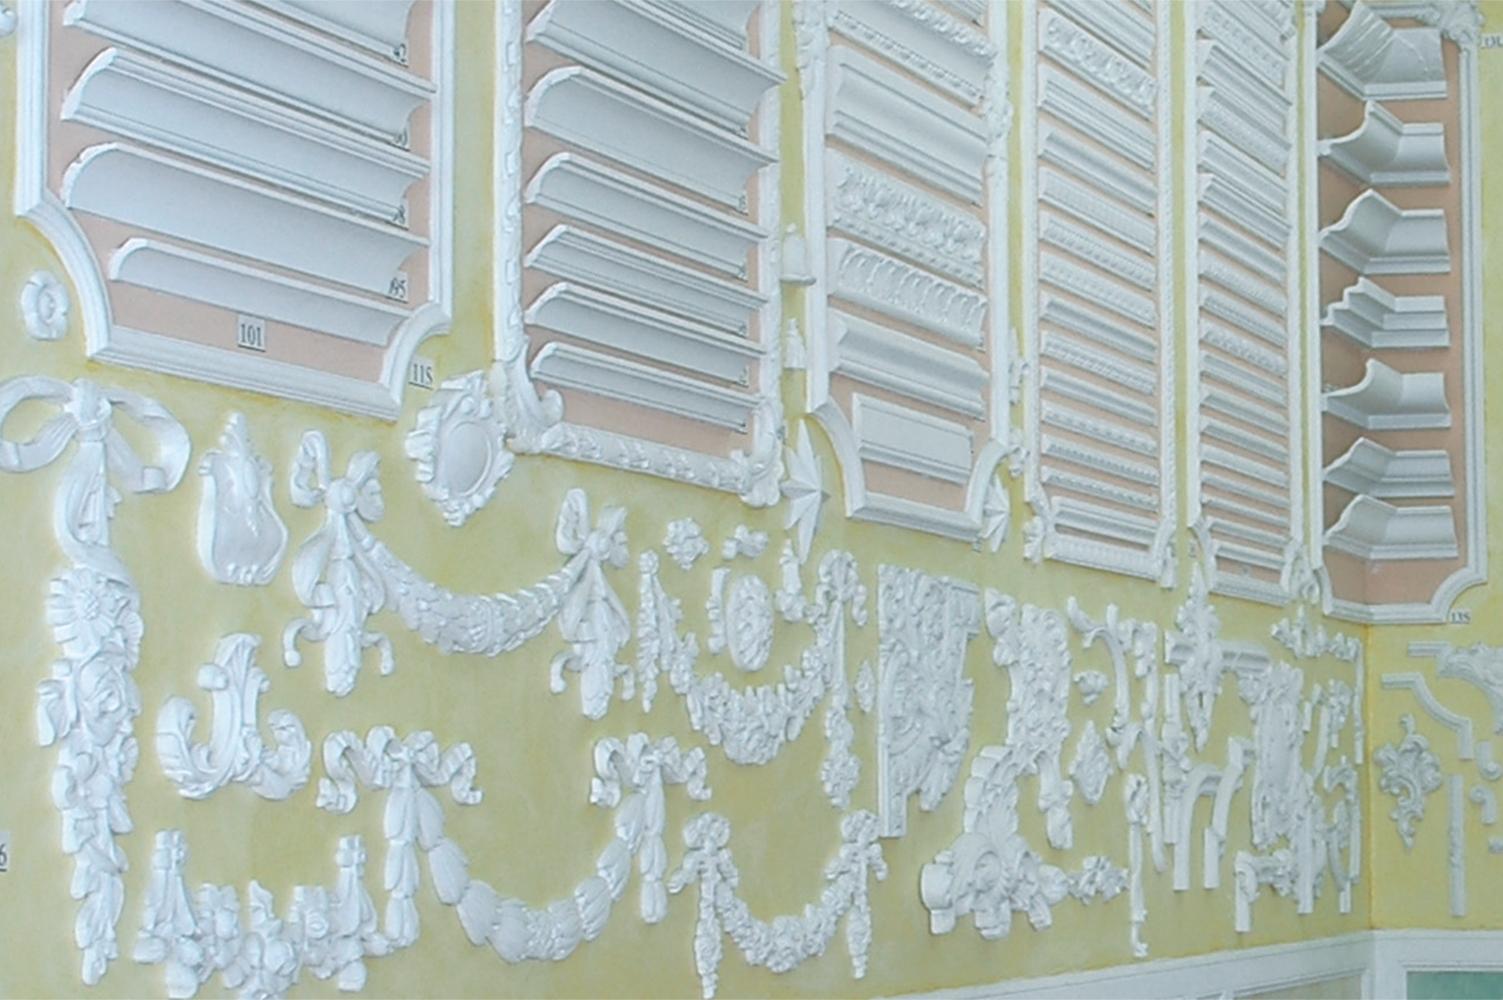 Ribichini stucchi produzione stucchi decorativi a roma - Stucchi decorativi prezzi ...